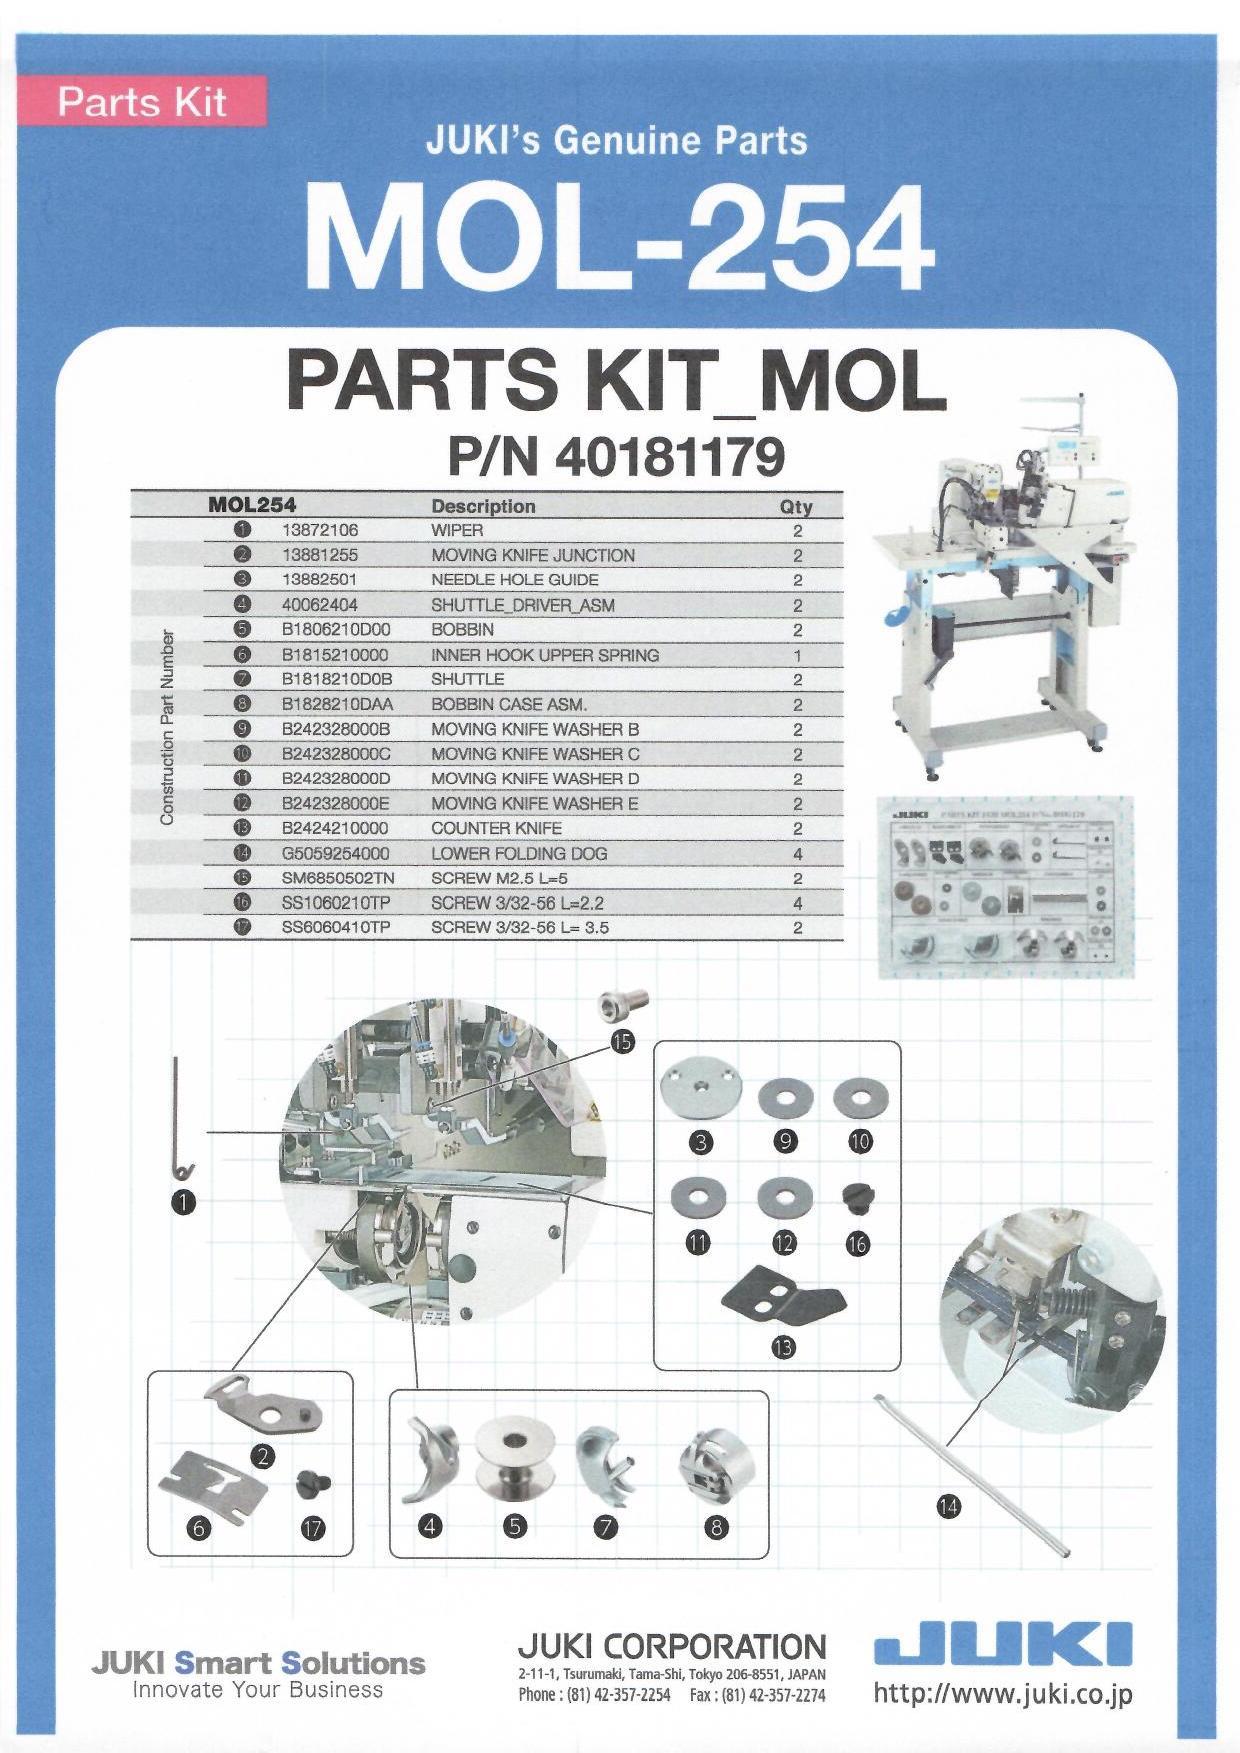 MOL-254